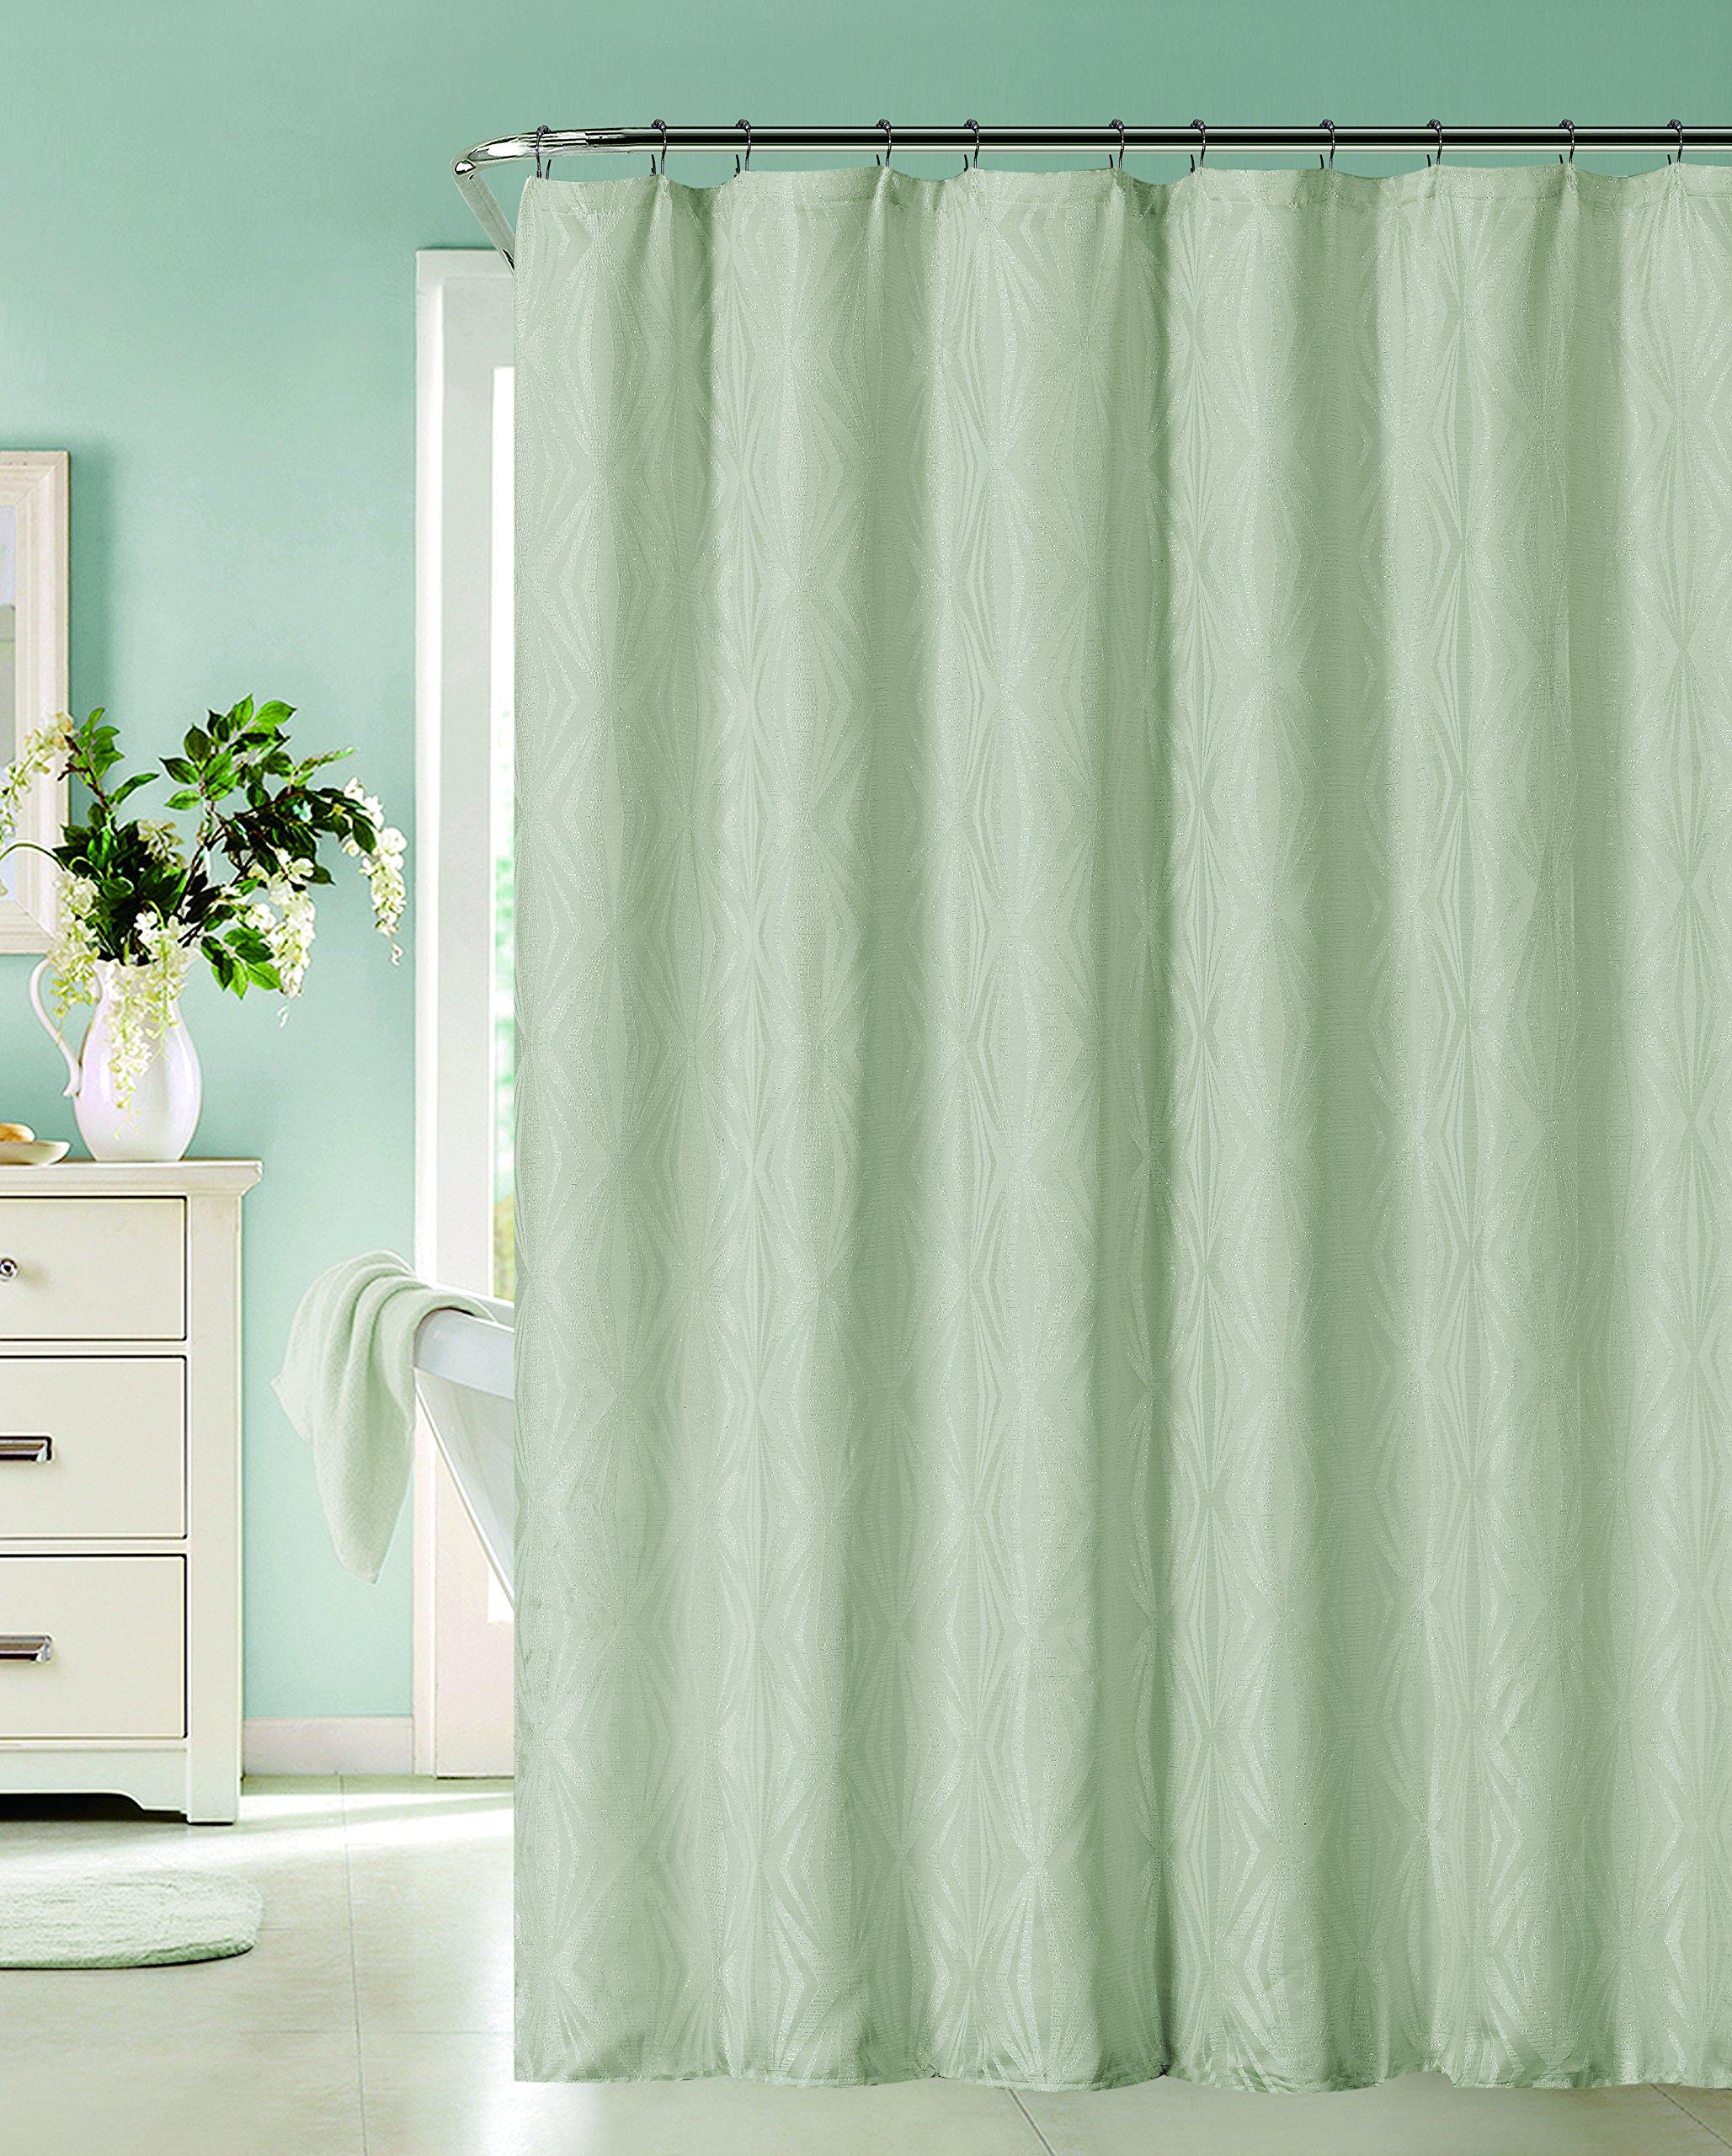 Dainty Home Romance Shower Curtain, Spa